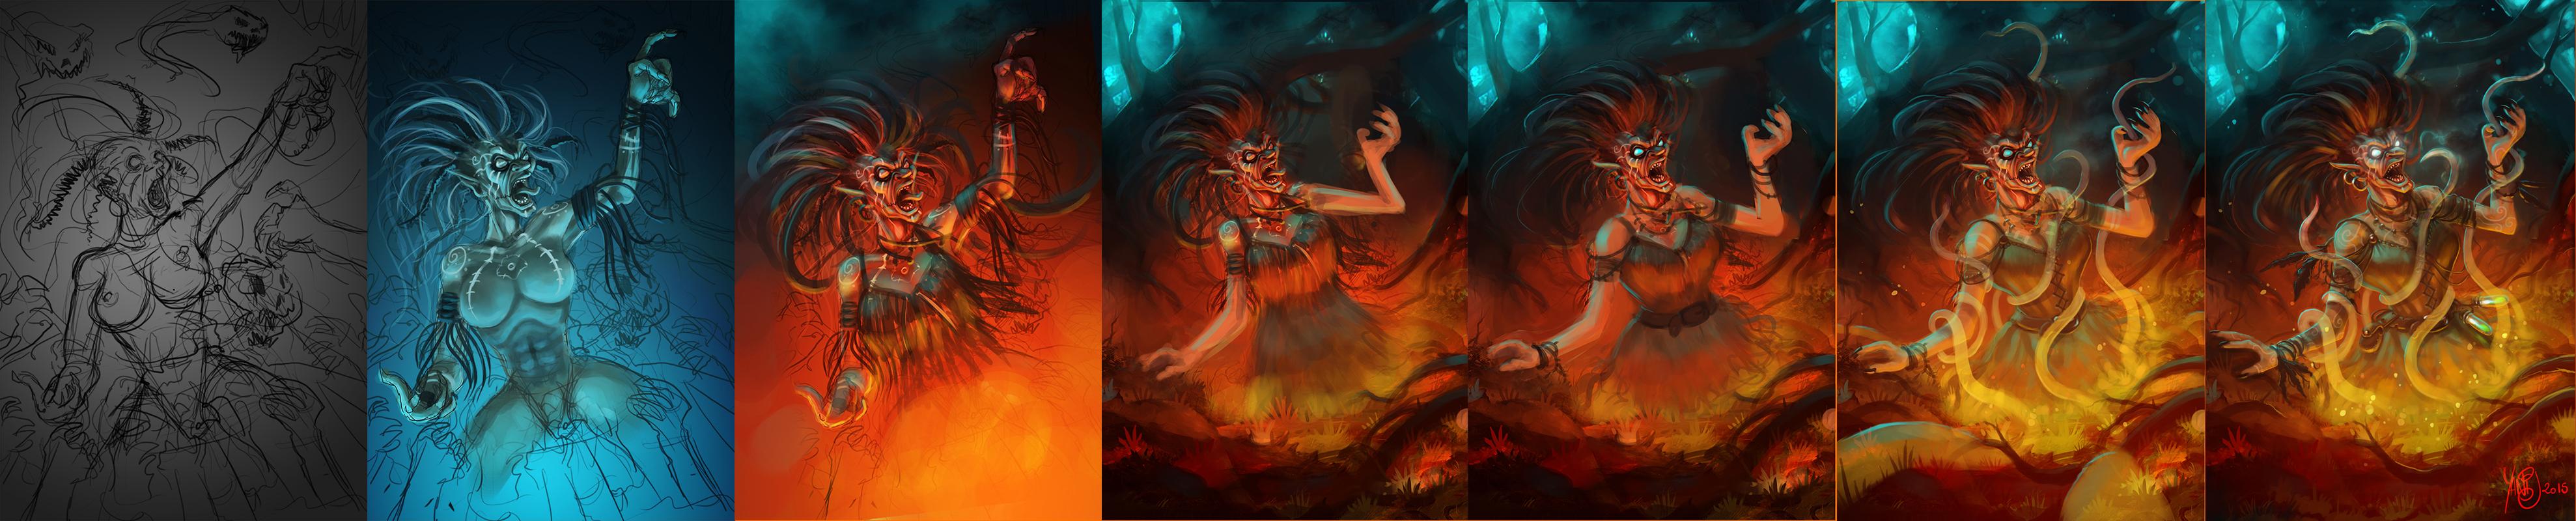 Digital painting de Traaw : Digit en vrac - Page 7 1ba8190edf116d091cc17754422f6858-d9gzs45